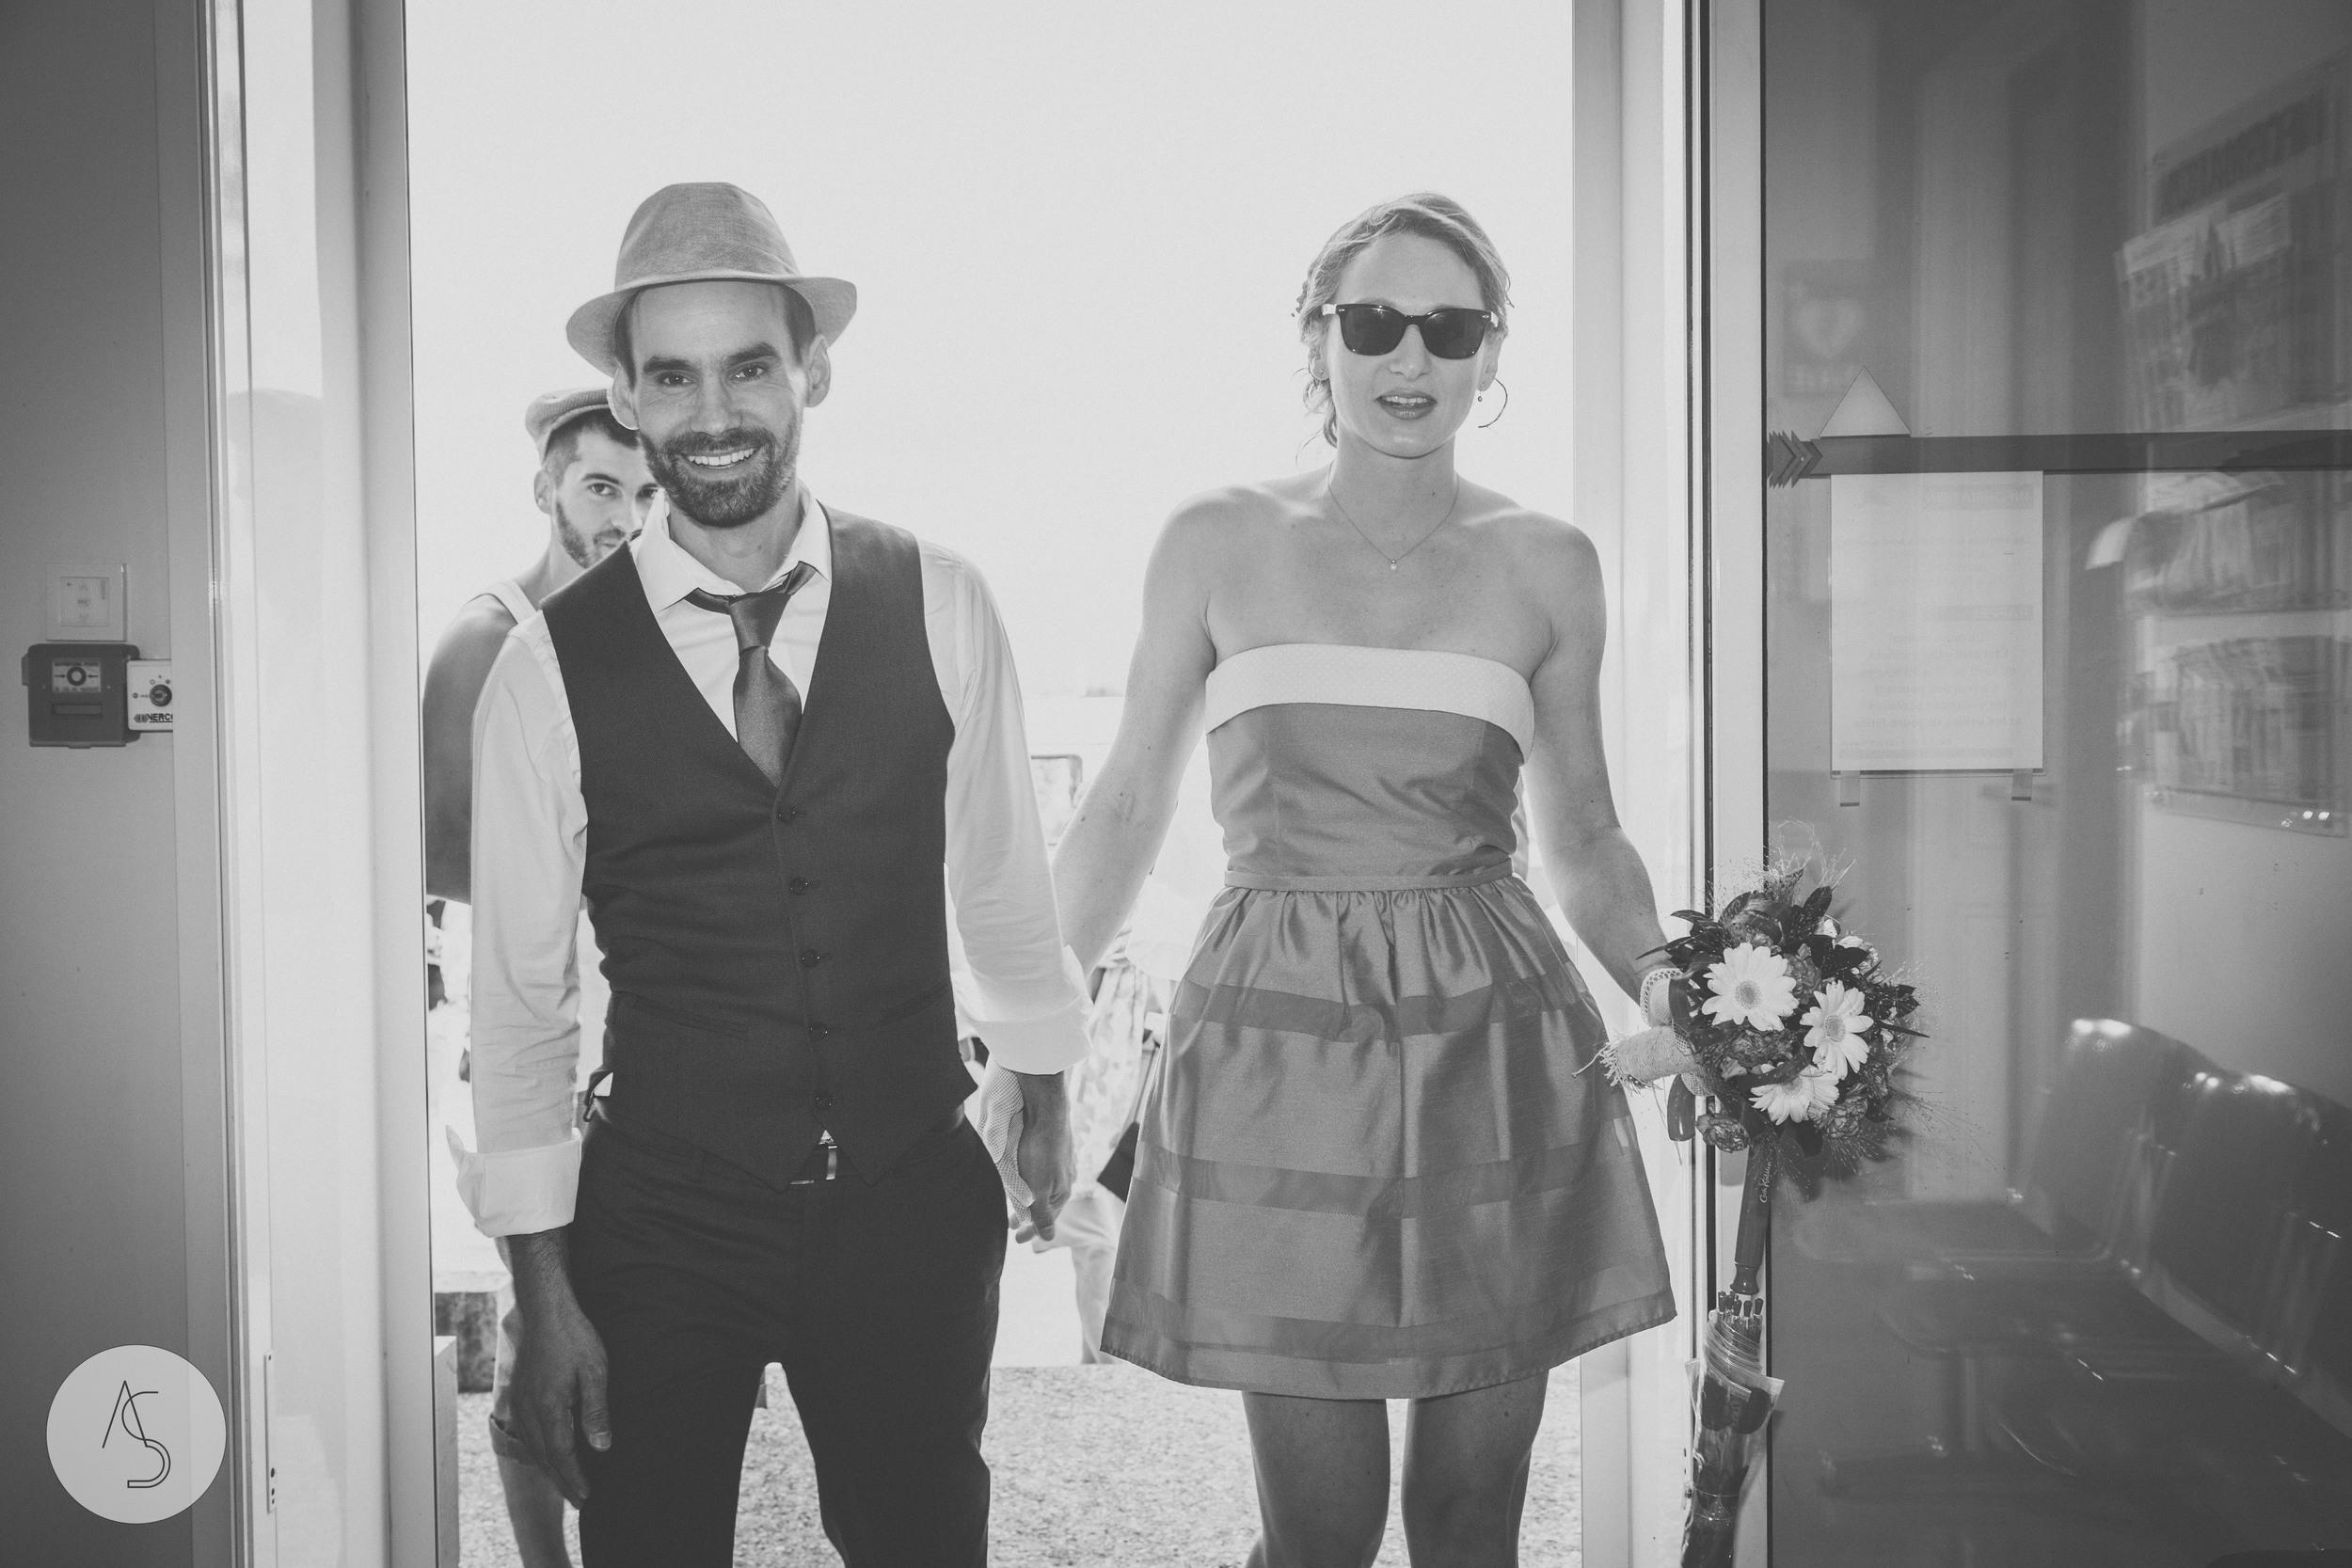 photographe mariage - Grenoble - Rhone Alpes - Adriana Salazar photo-67.jpg